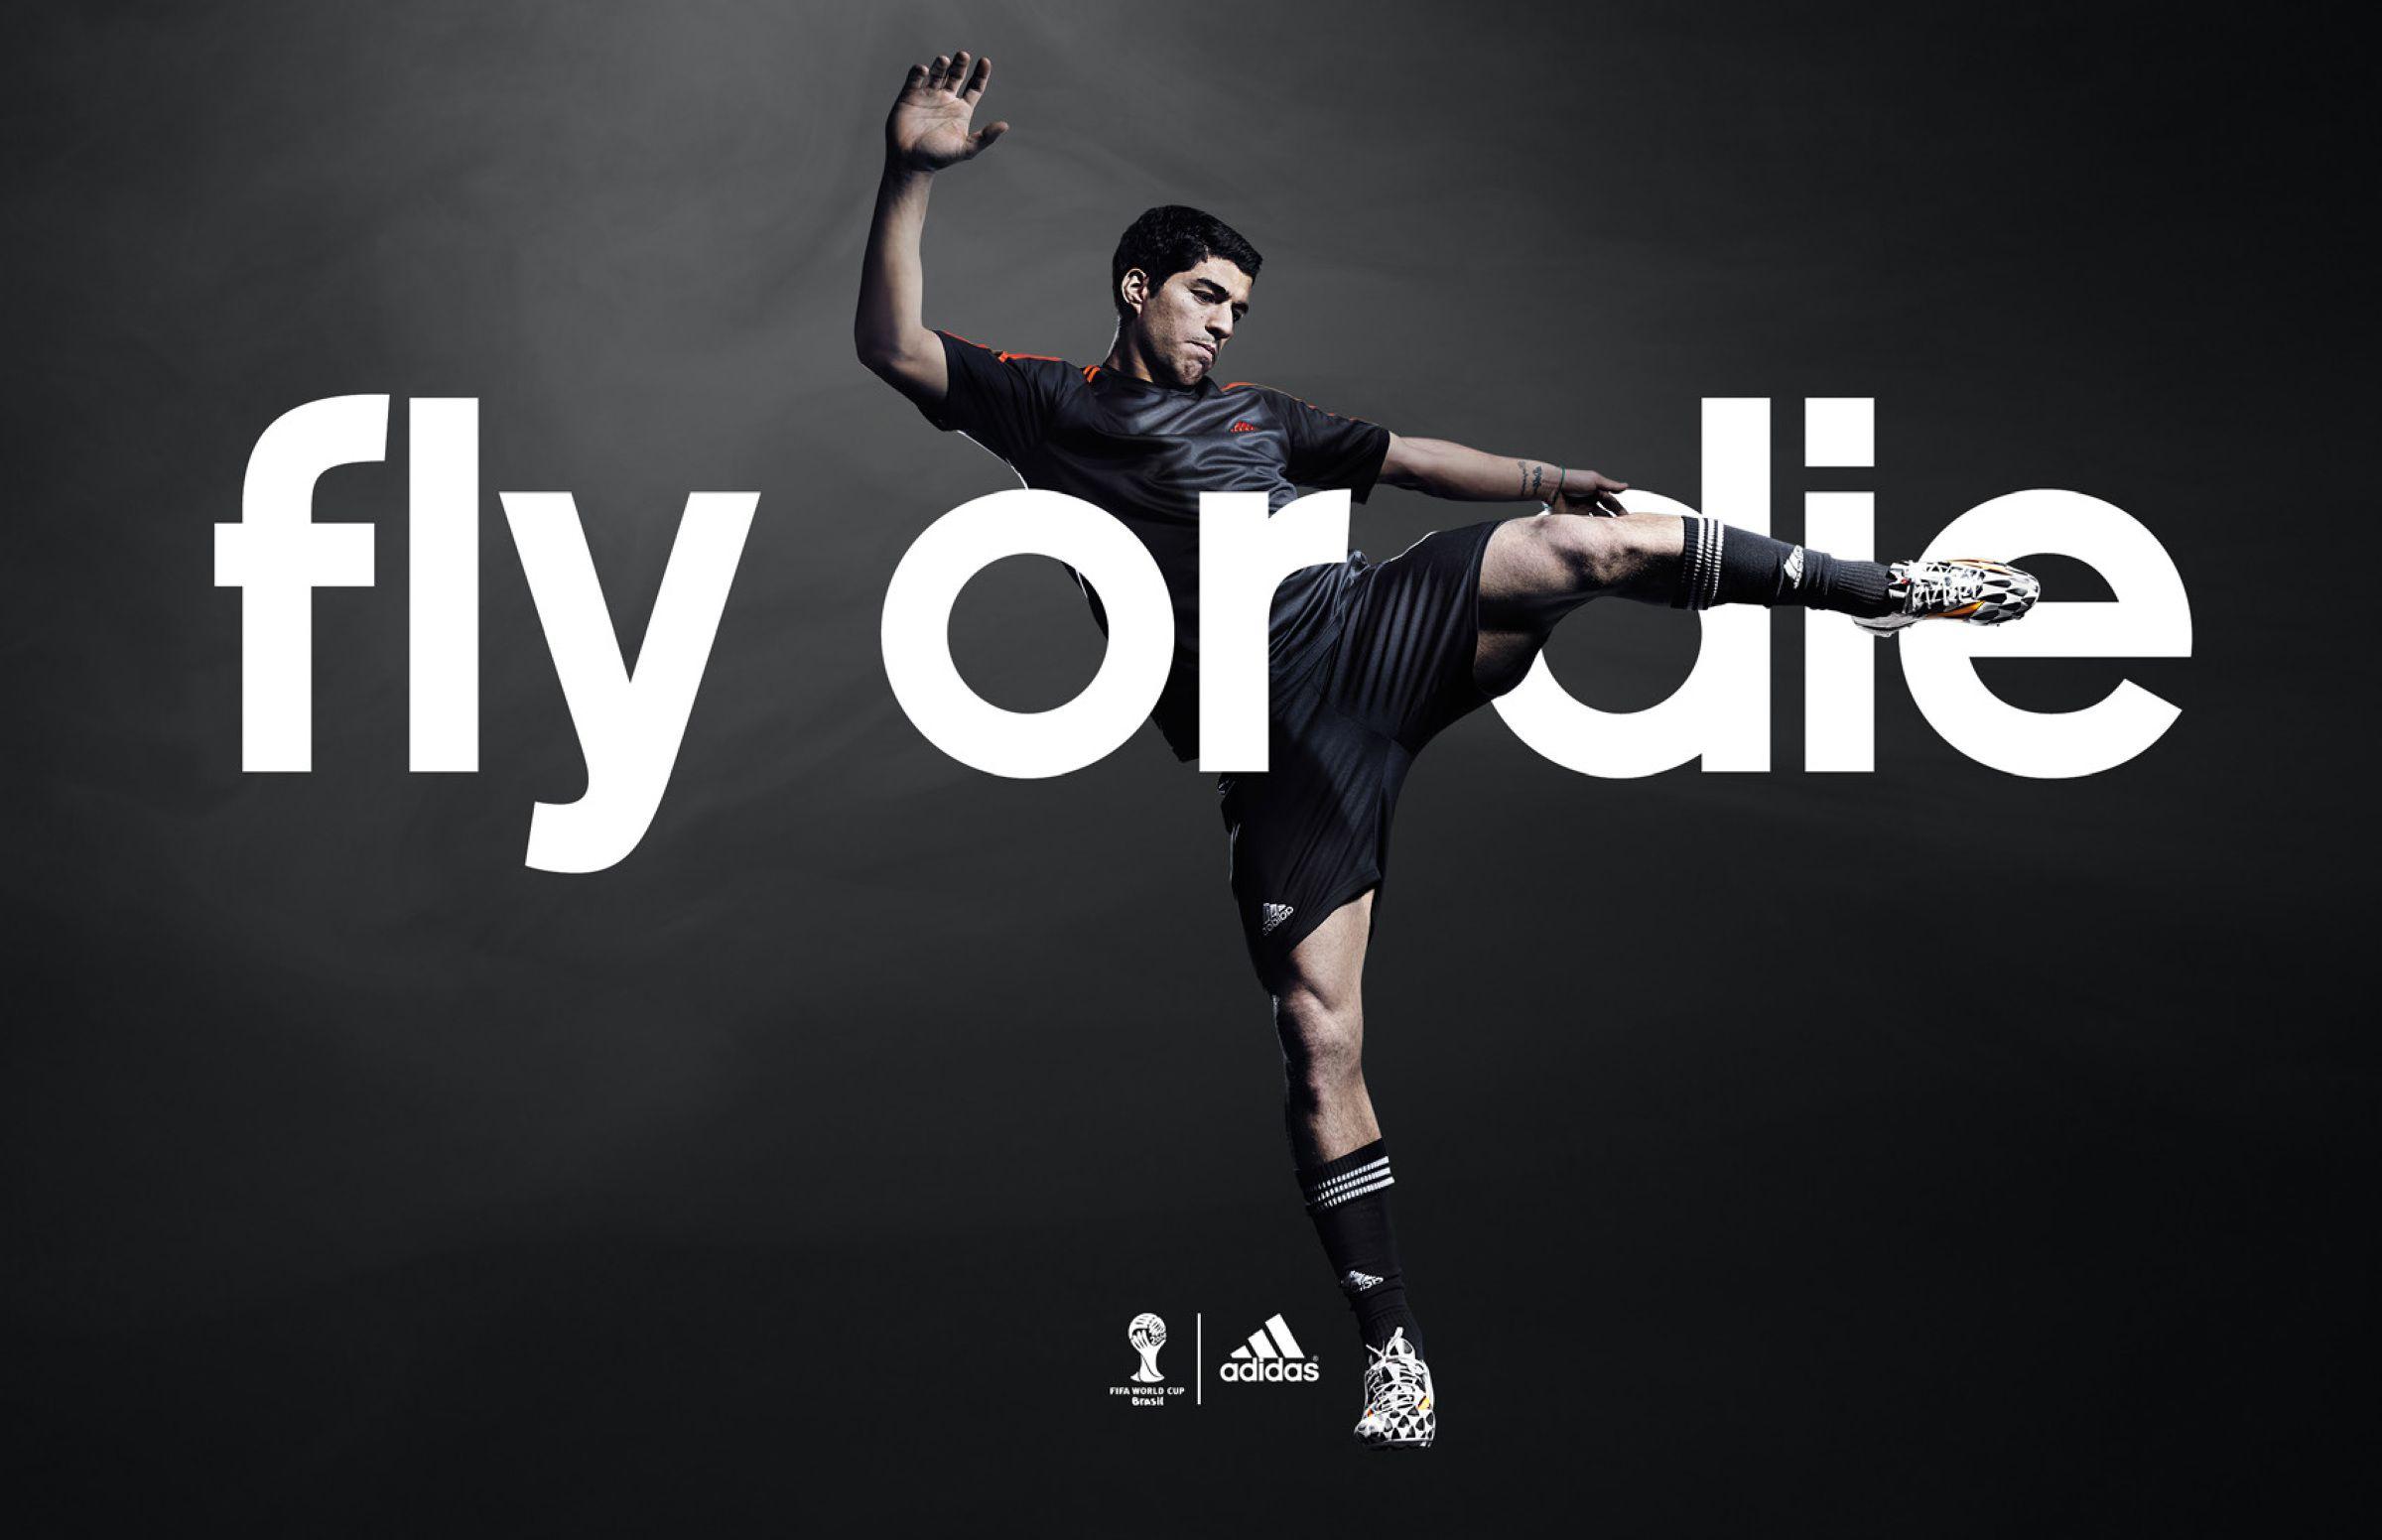 adidas original advert poster - photo #24